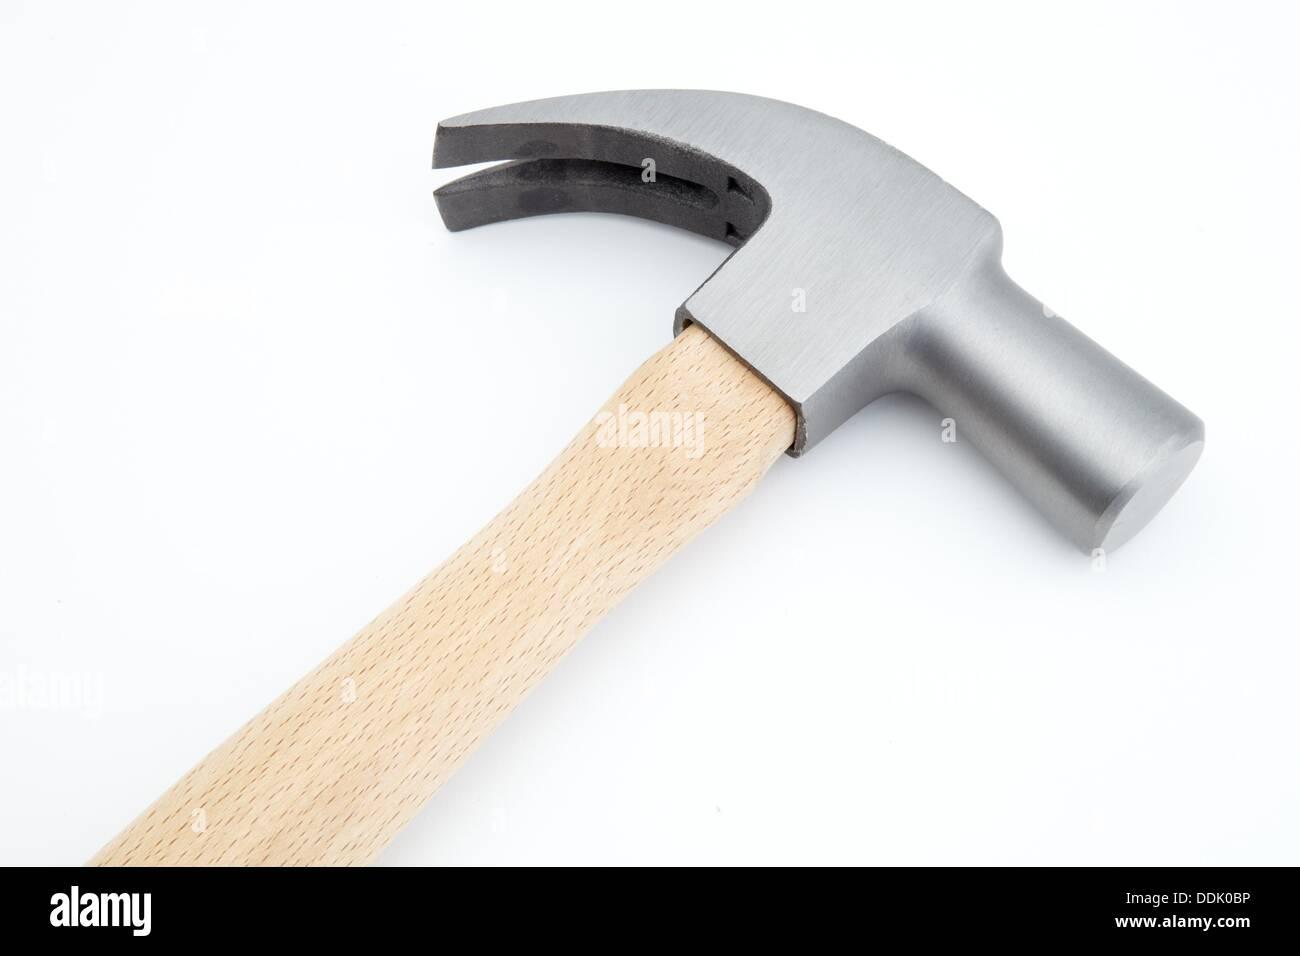 American hammer, Carpentry hammer, Building hand tools Stock Photo ...